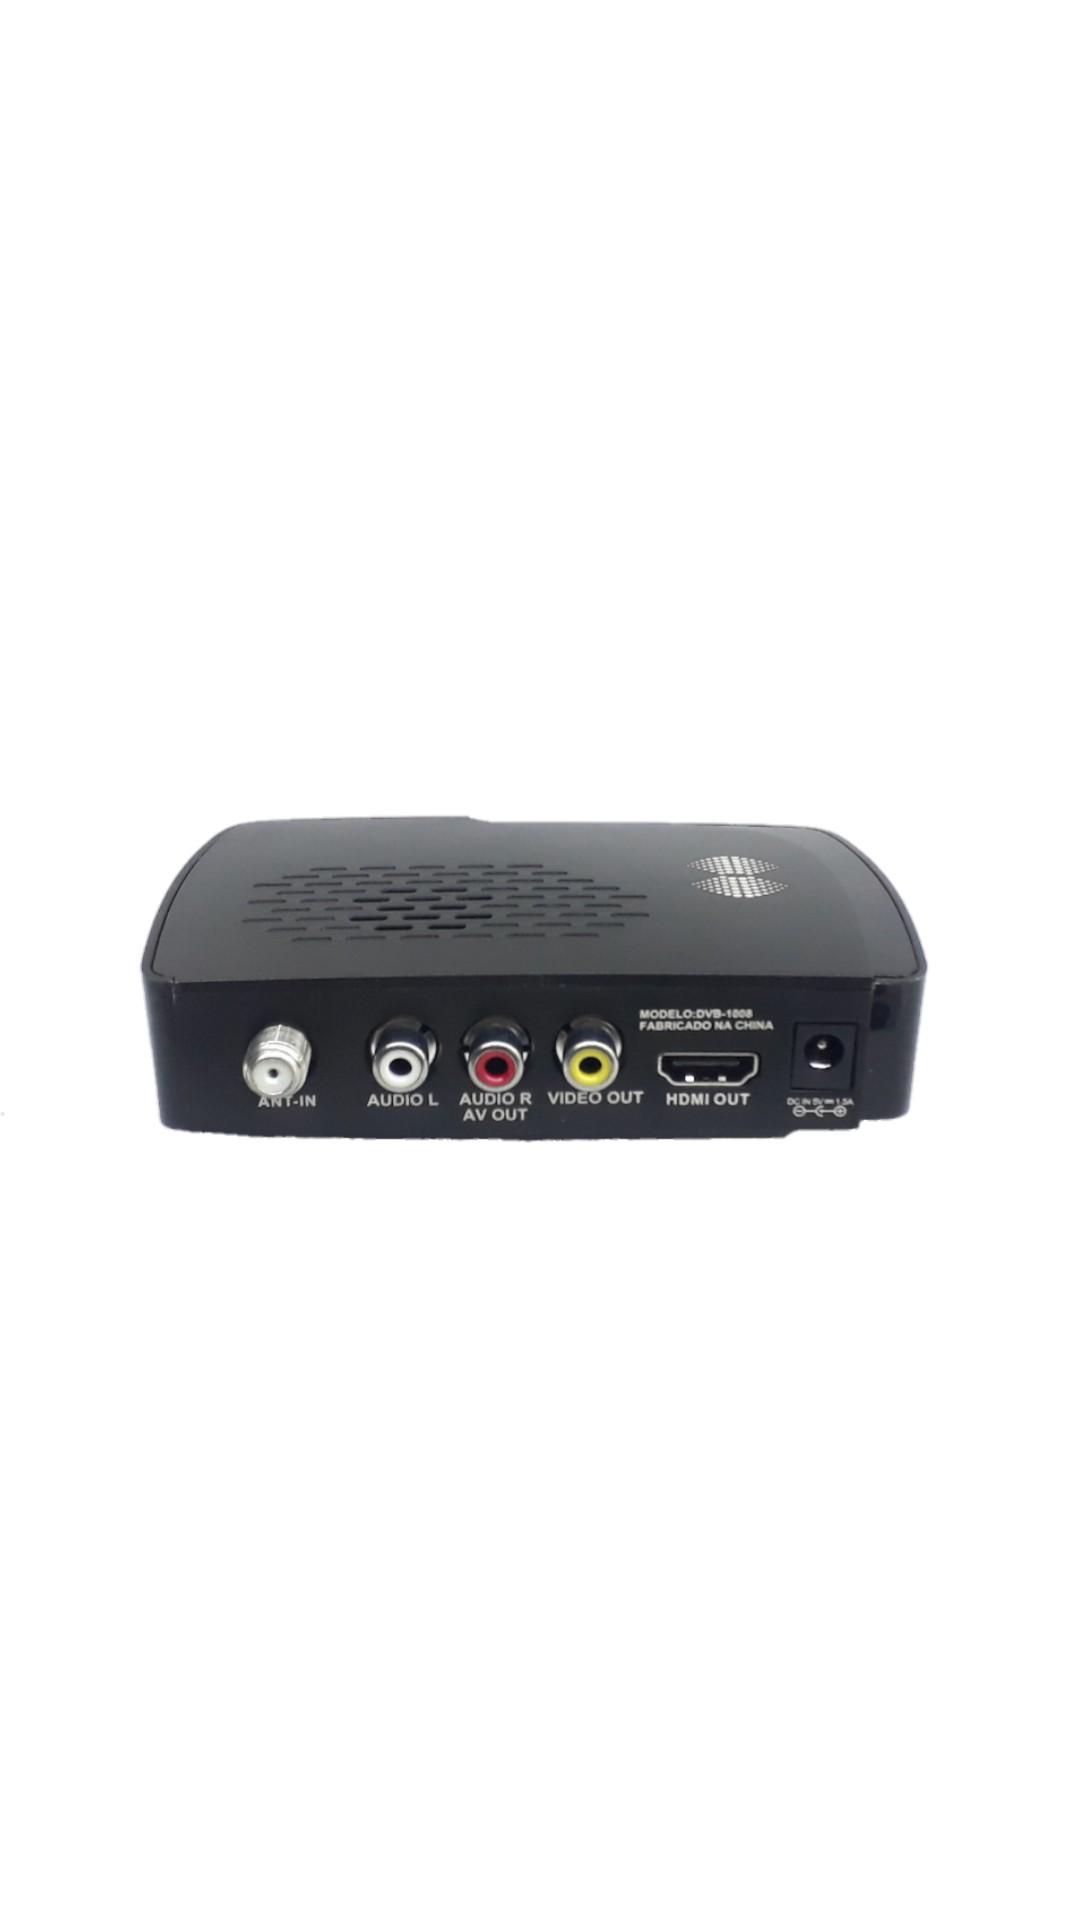 Conversor Compell Isdbt 499009 Receptor Digital Hd